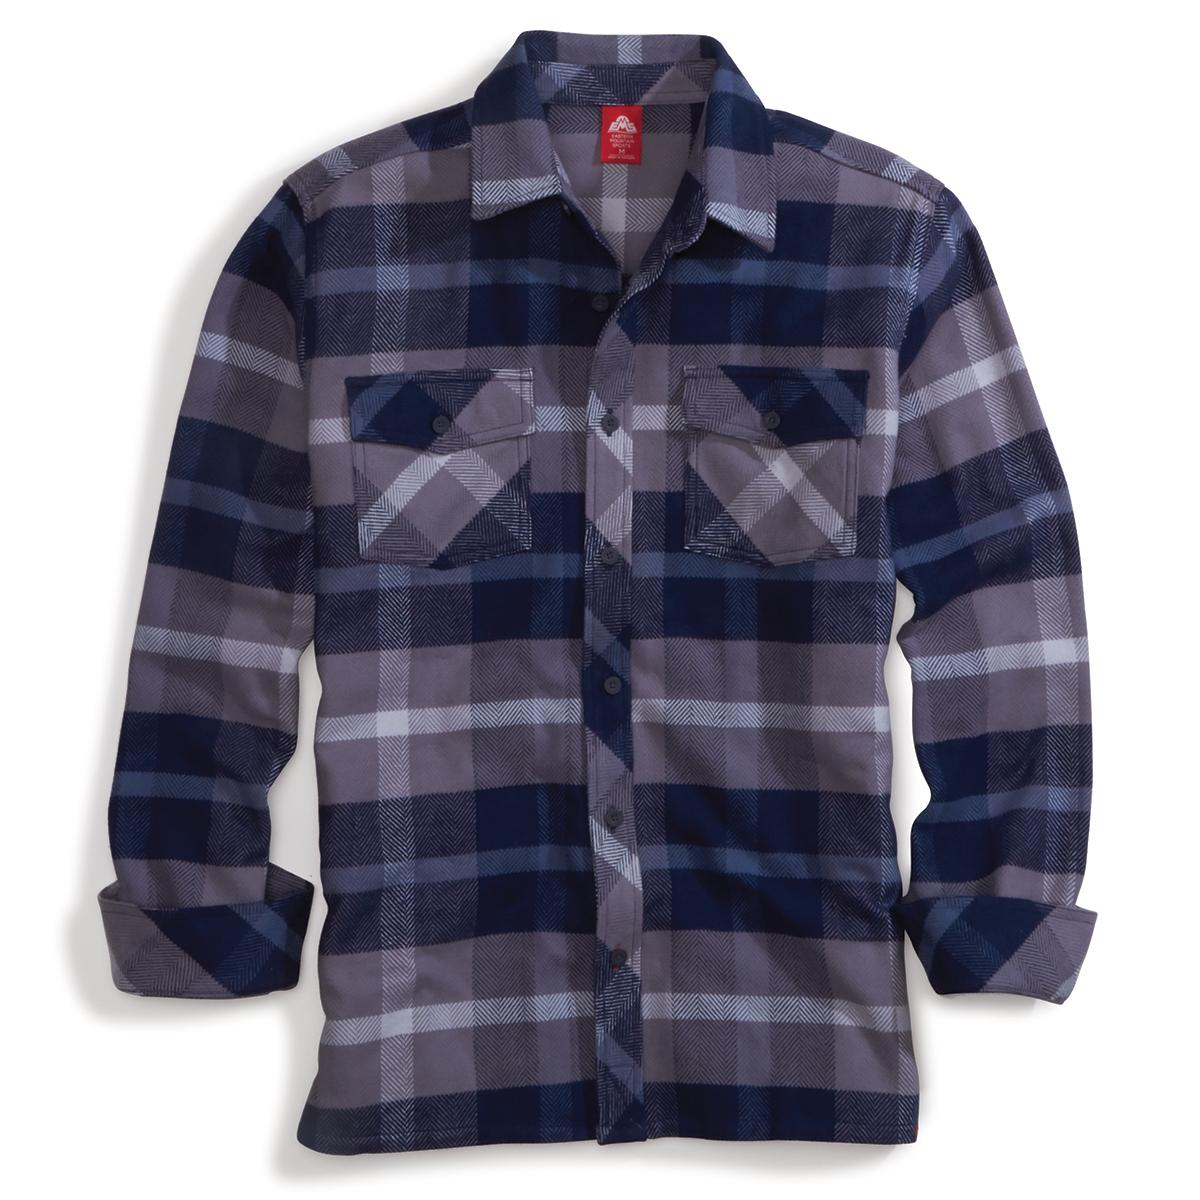 Ems Men's Cabin Flannel Long-Sleeve Shirt - Blue, S